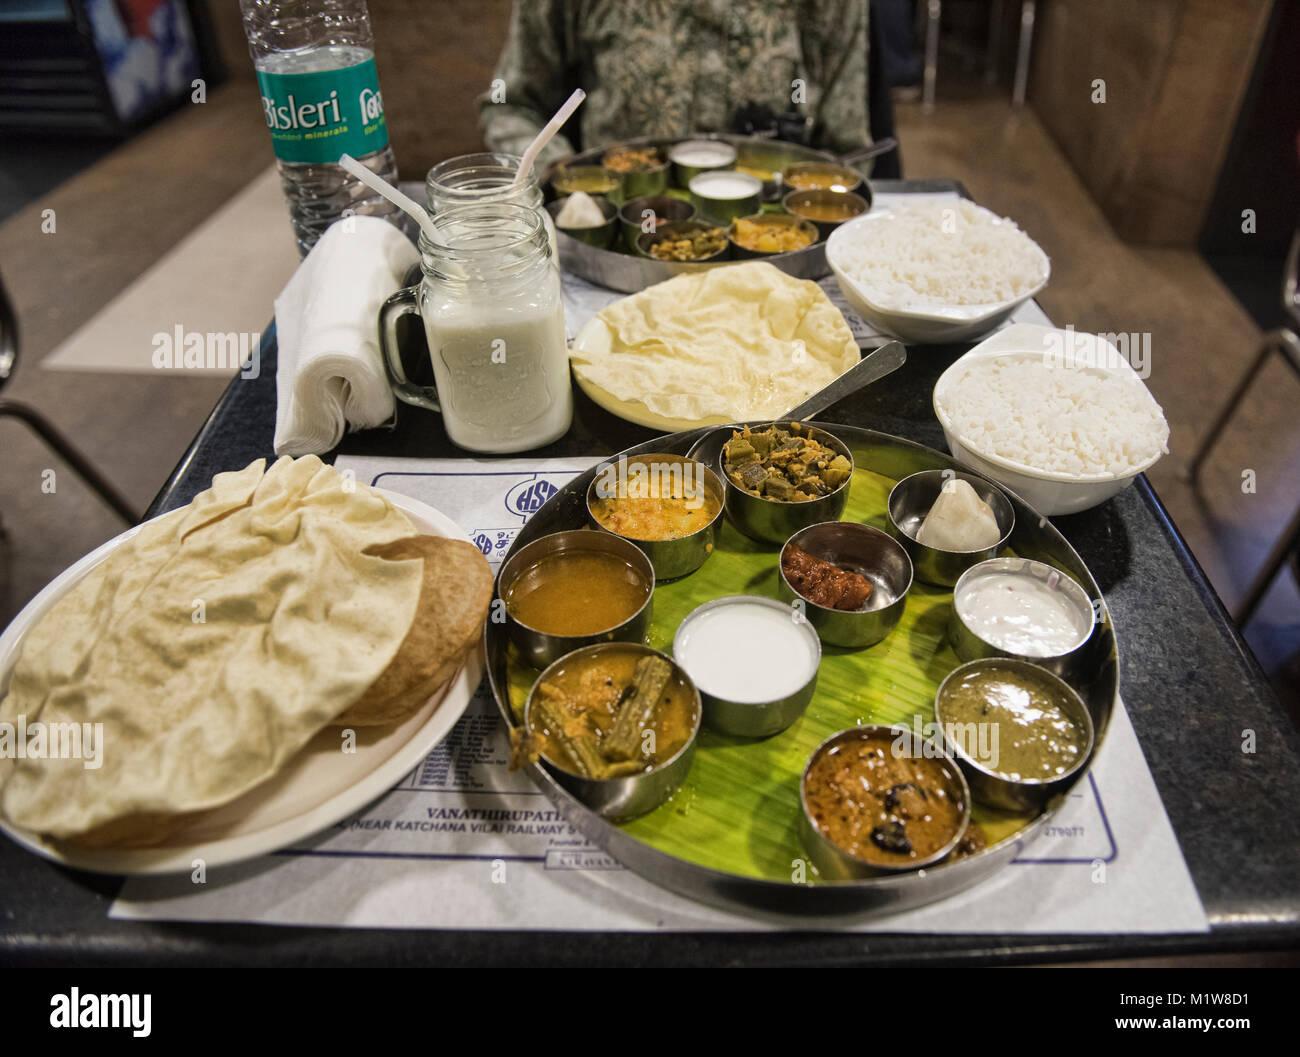 Southern Indian Thali at the legendary Saravana Bhavan Restaurant, New Delhi, India - Stock Image